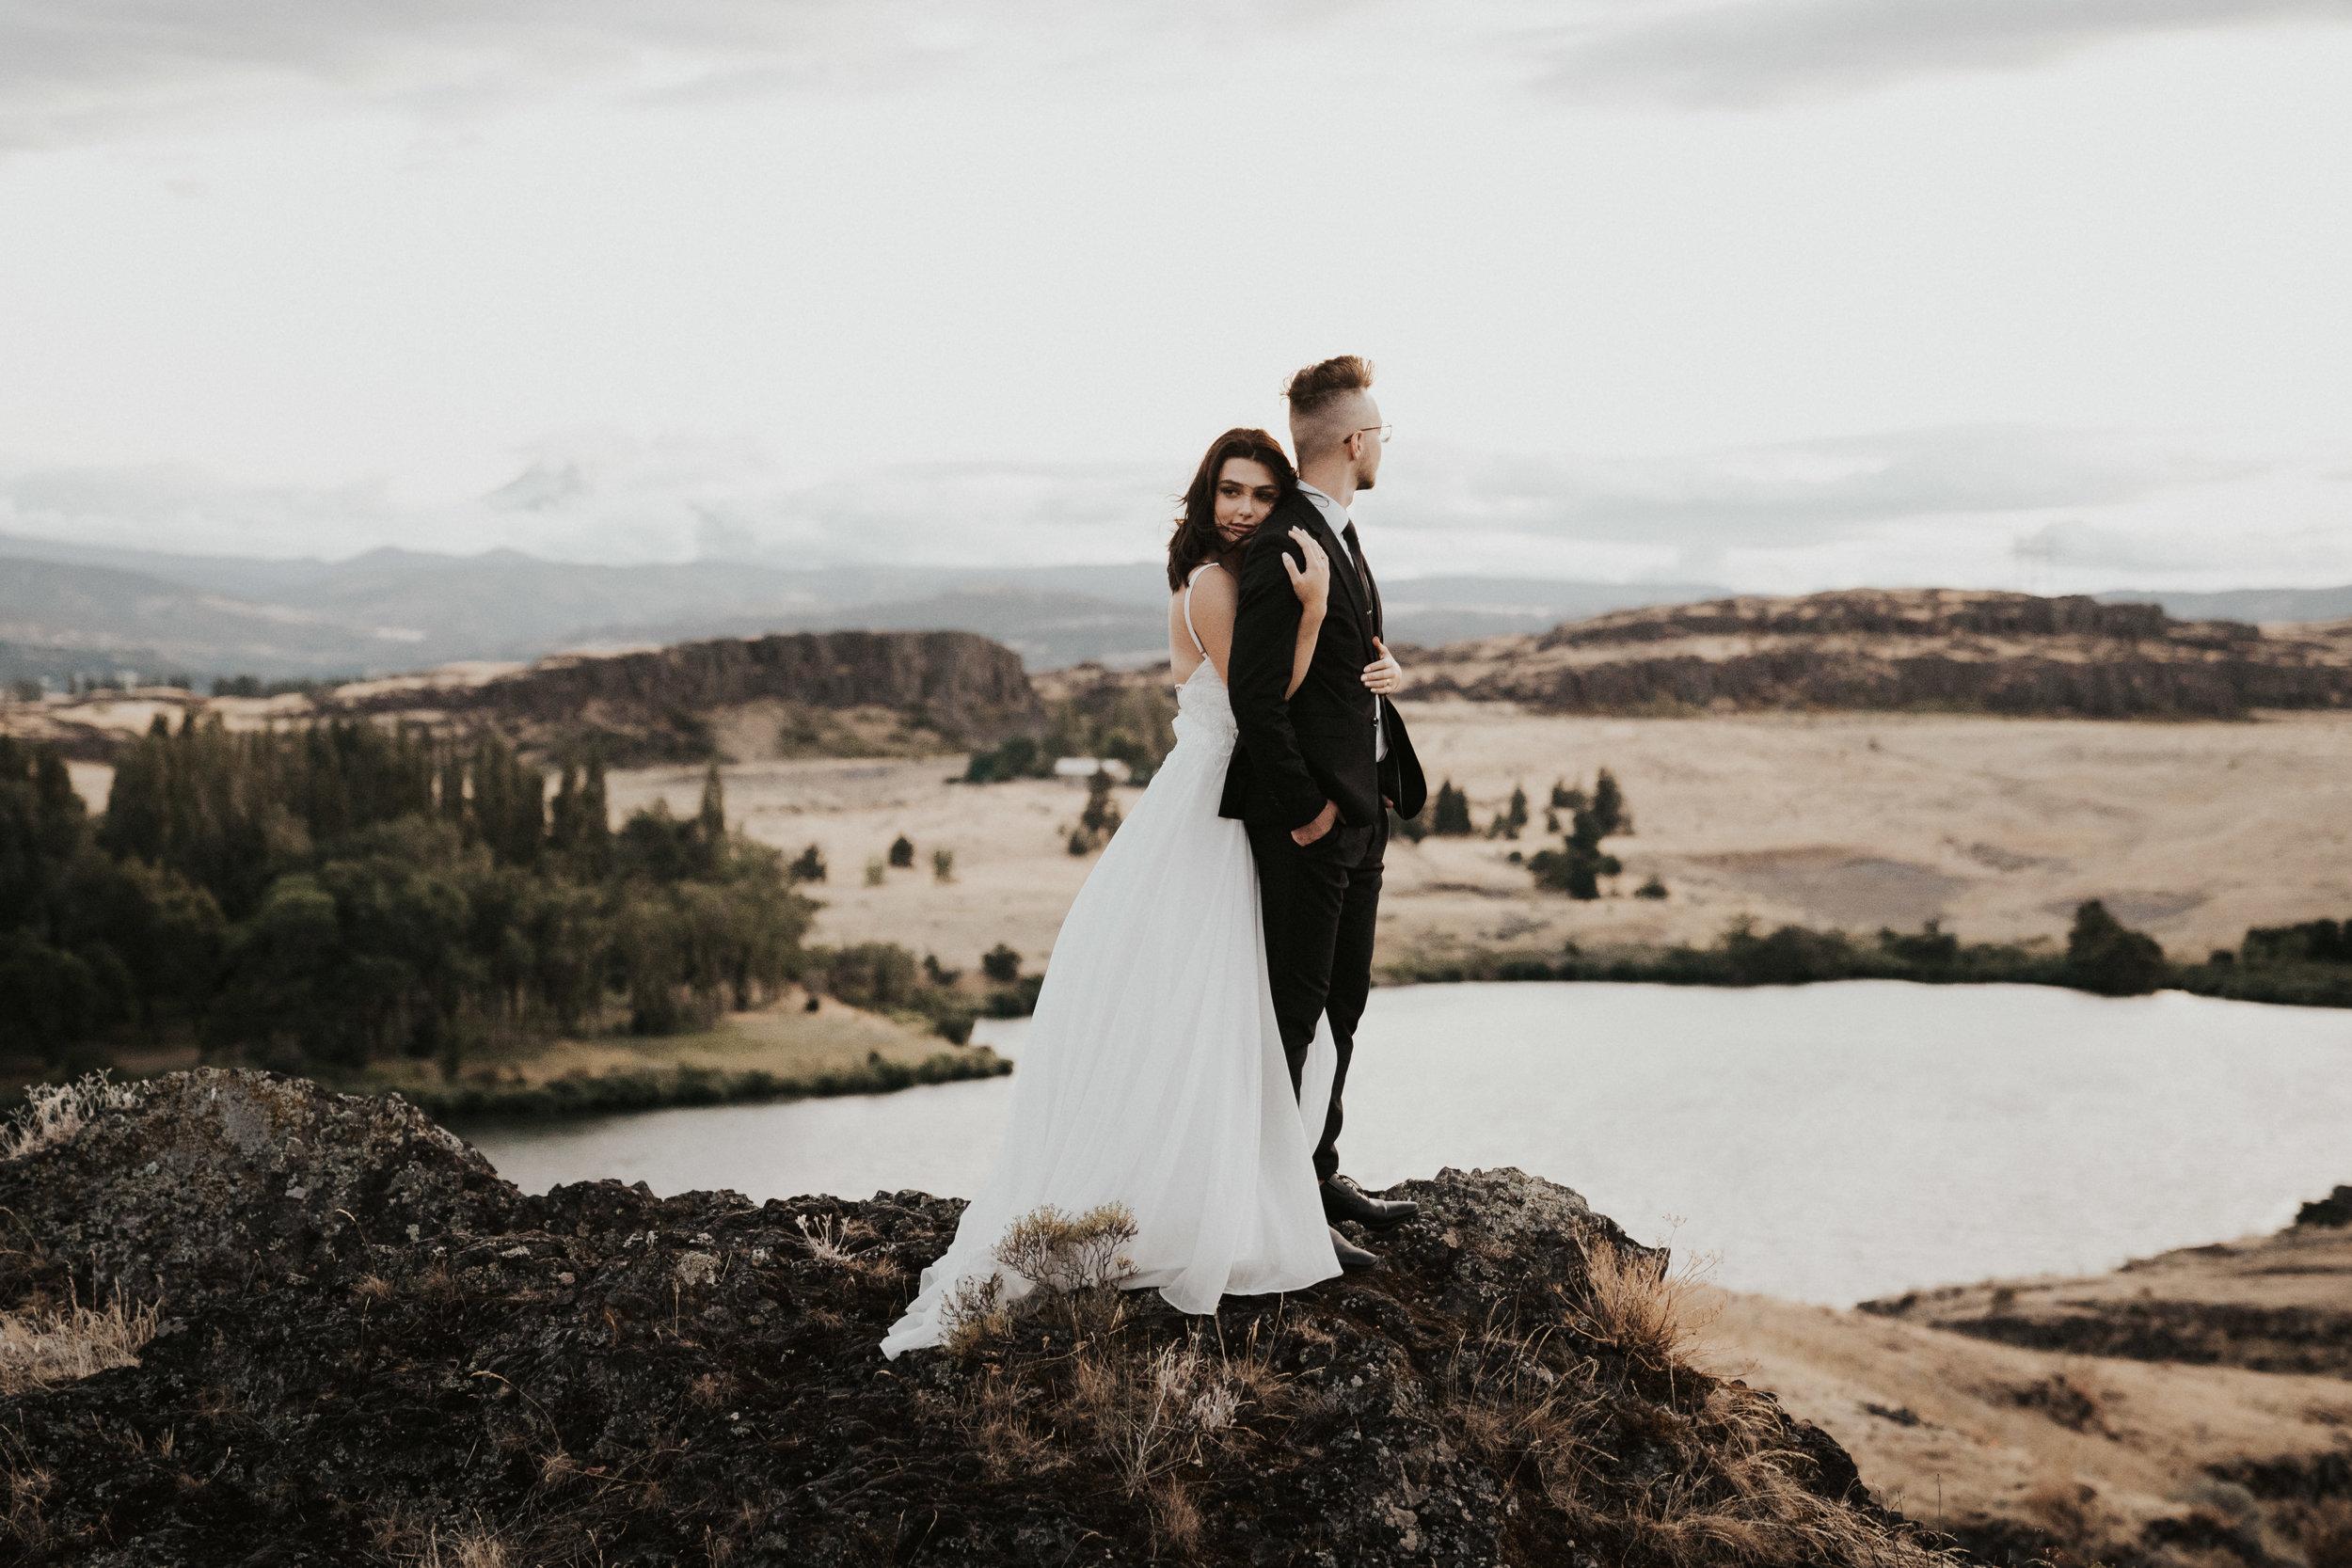 columbia-river-gorge-wedding-elopement-inspiration-67.jpg